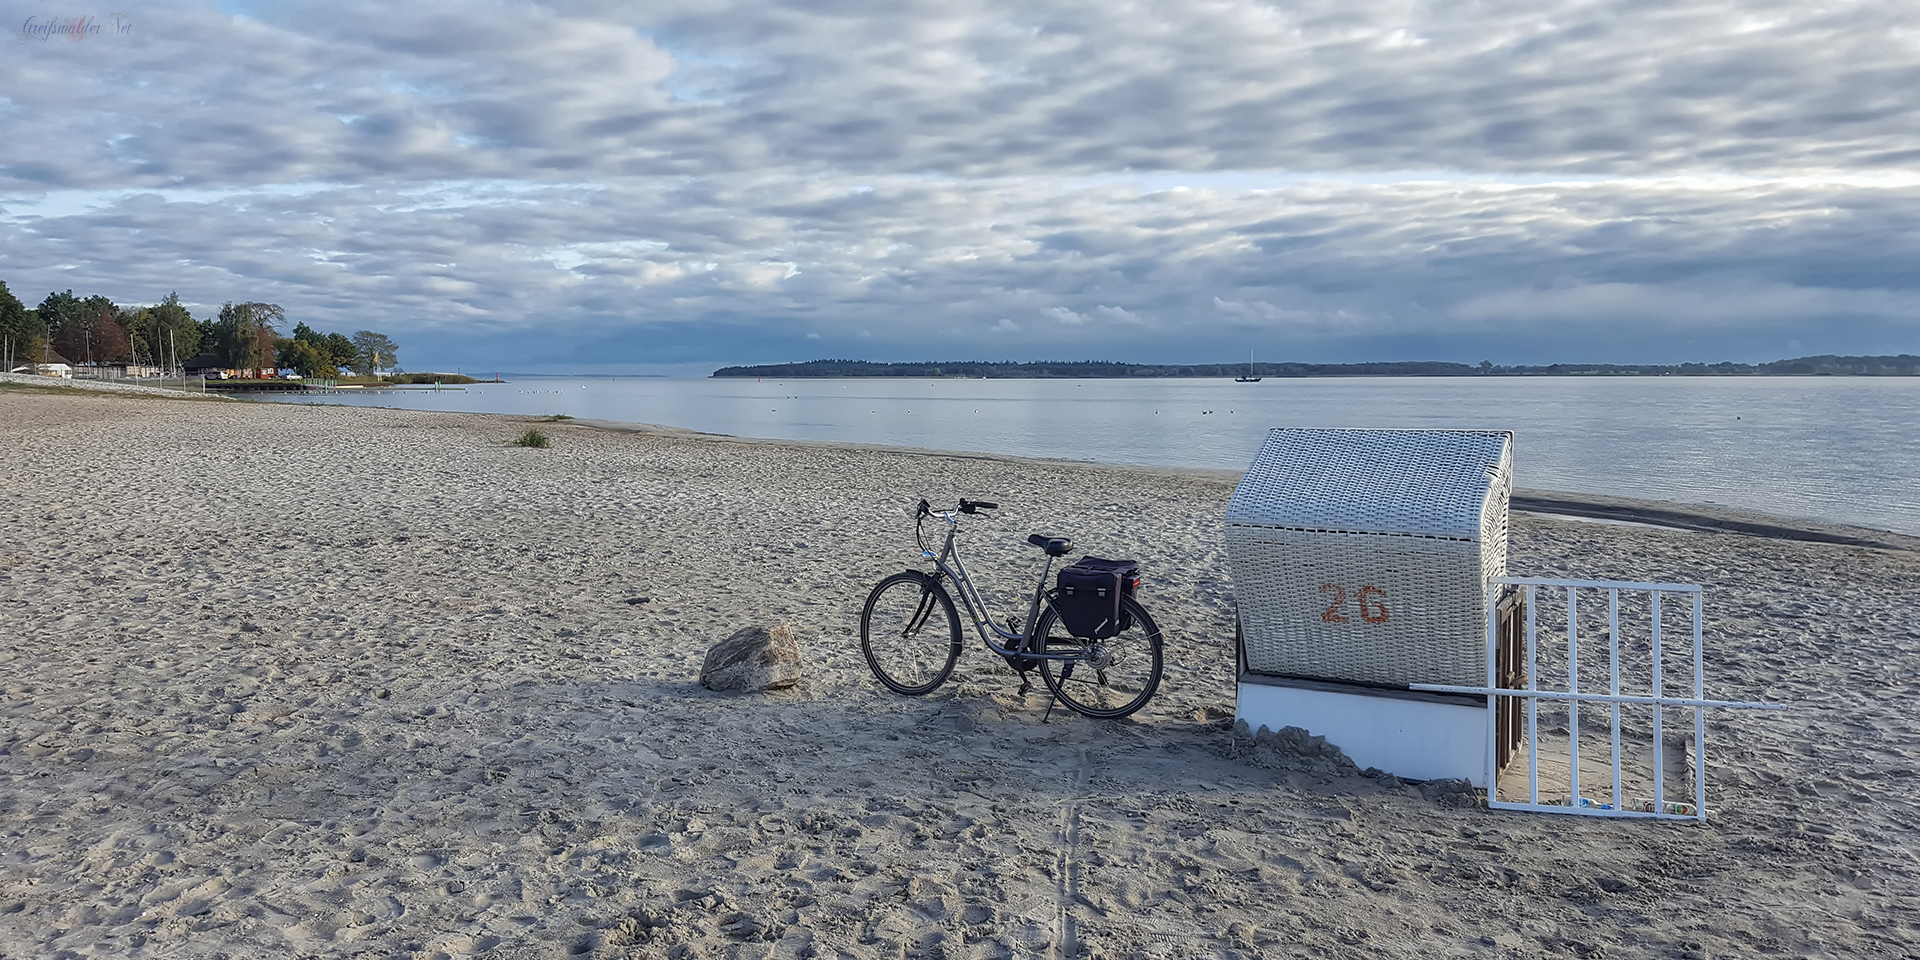 Herbst am Strand in Greifswald-Eldena